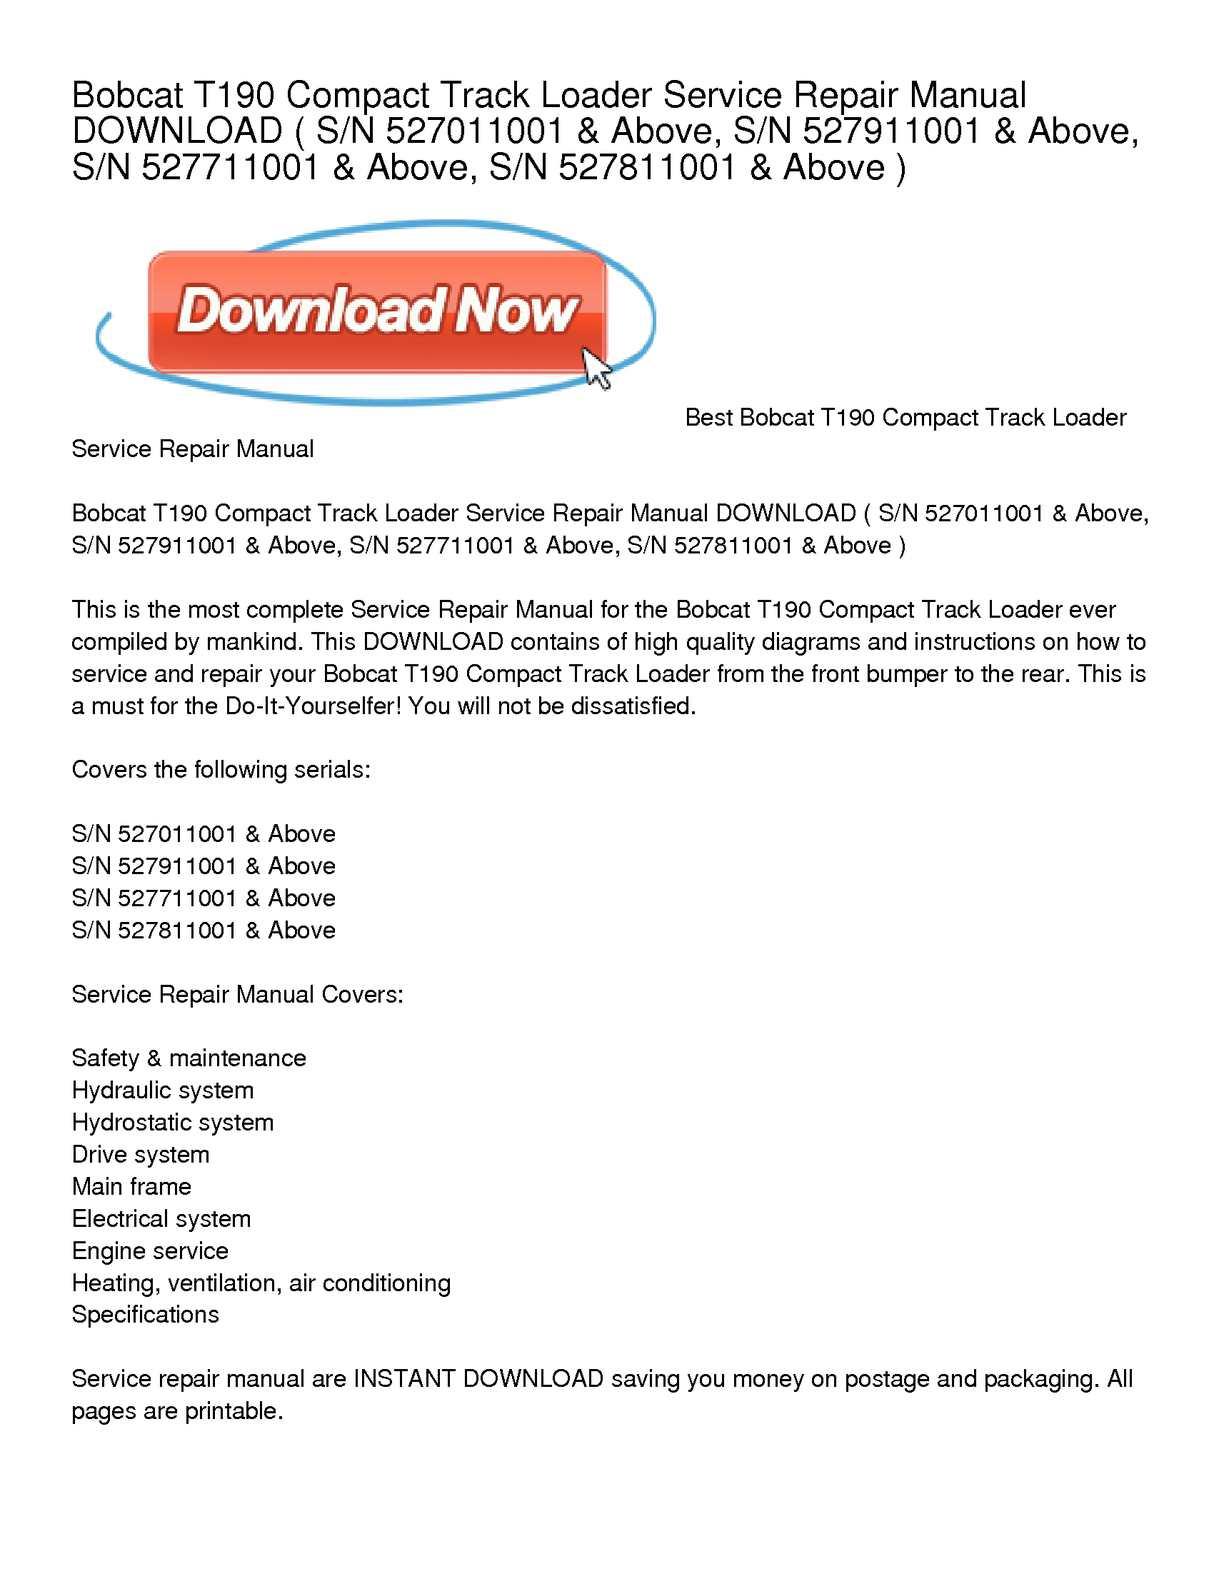 bobcat t190 compact track loader service repair manual download